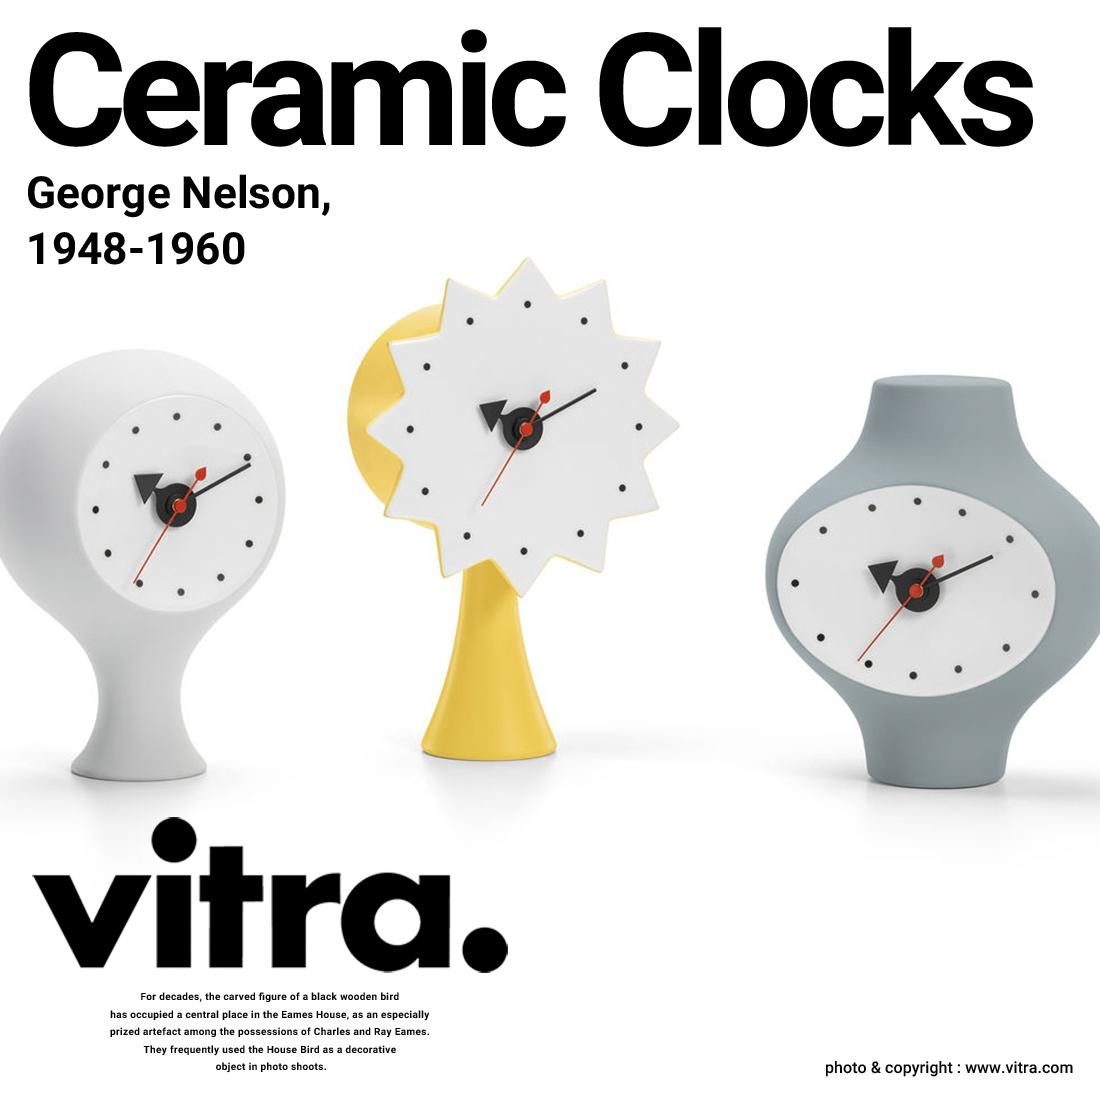 【Vitra】Ceramic Clocks セラミック クロッククロック 置き時計 George Nelson ジョージ・ネルソン ヴィトラ 陶器【コンビニ受取対応商品】